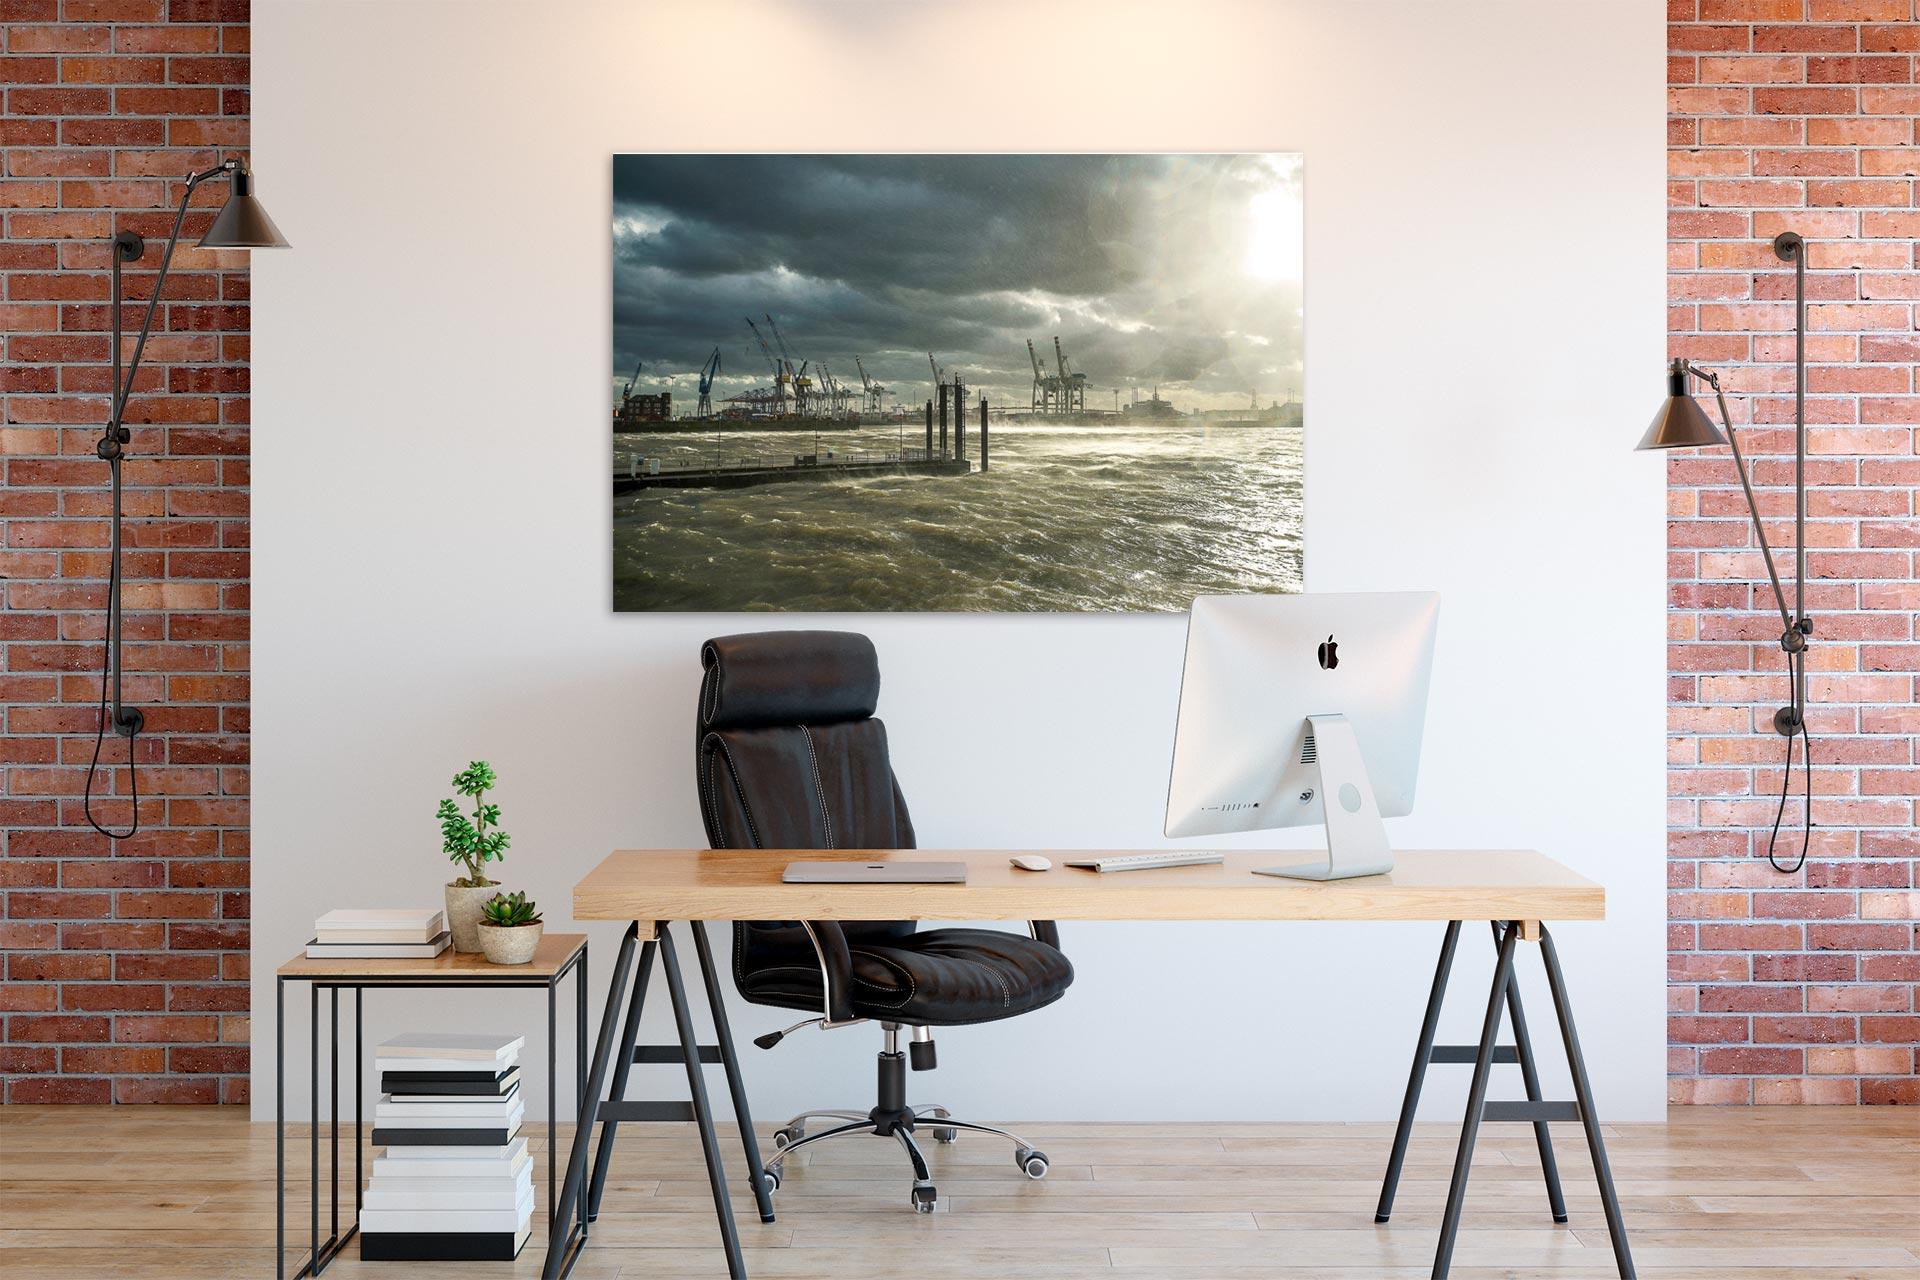 LCW270-hafensturm-hamburg-wandbild-bild-auf-leinwand-acrylglas-aludibond_buero